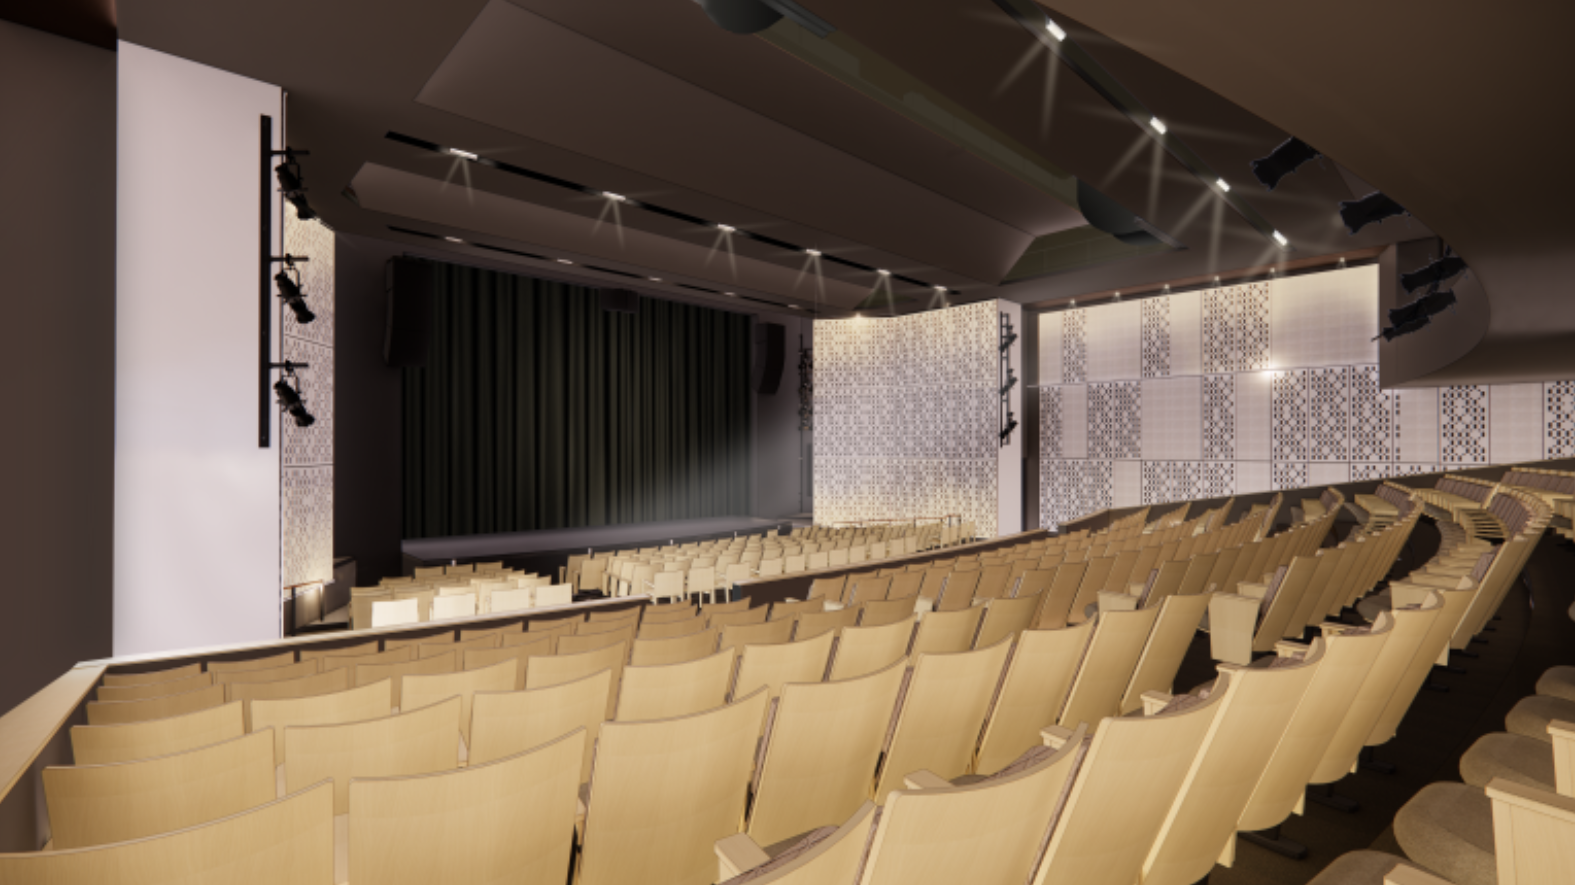 Department of Theatre, Film, and Media Arts Theatre Space